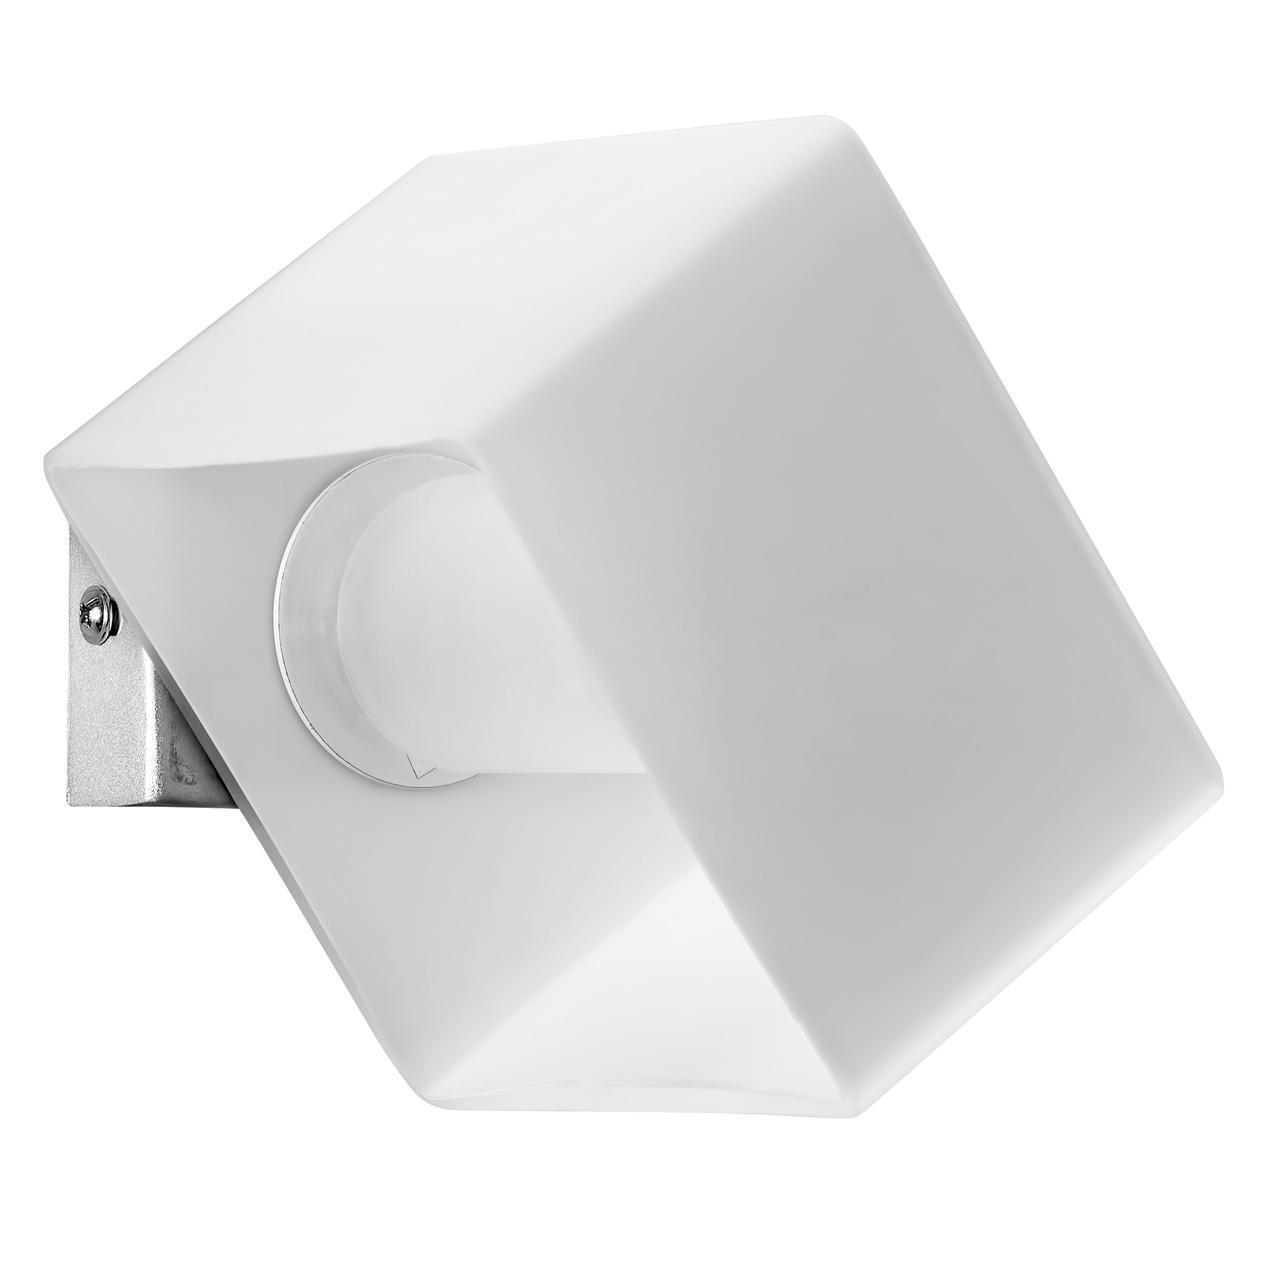 Настенный светильник Lightstar Pezzo 801610 бра lightstar simple light 801610